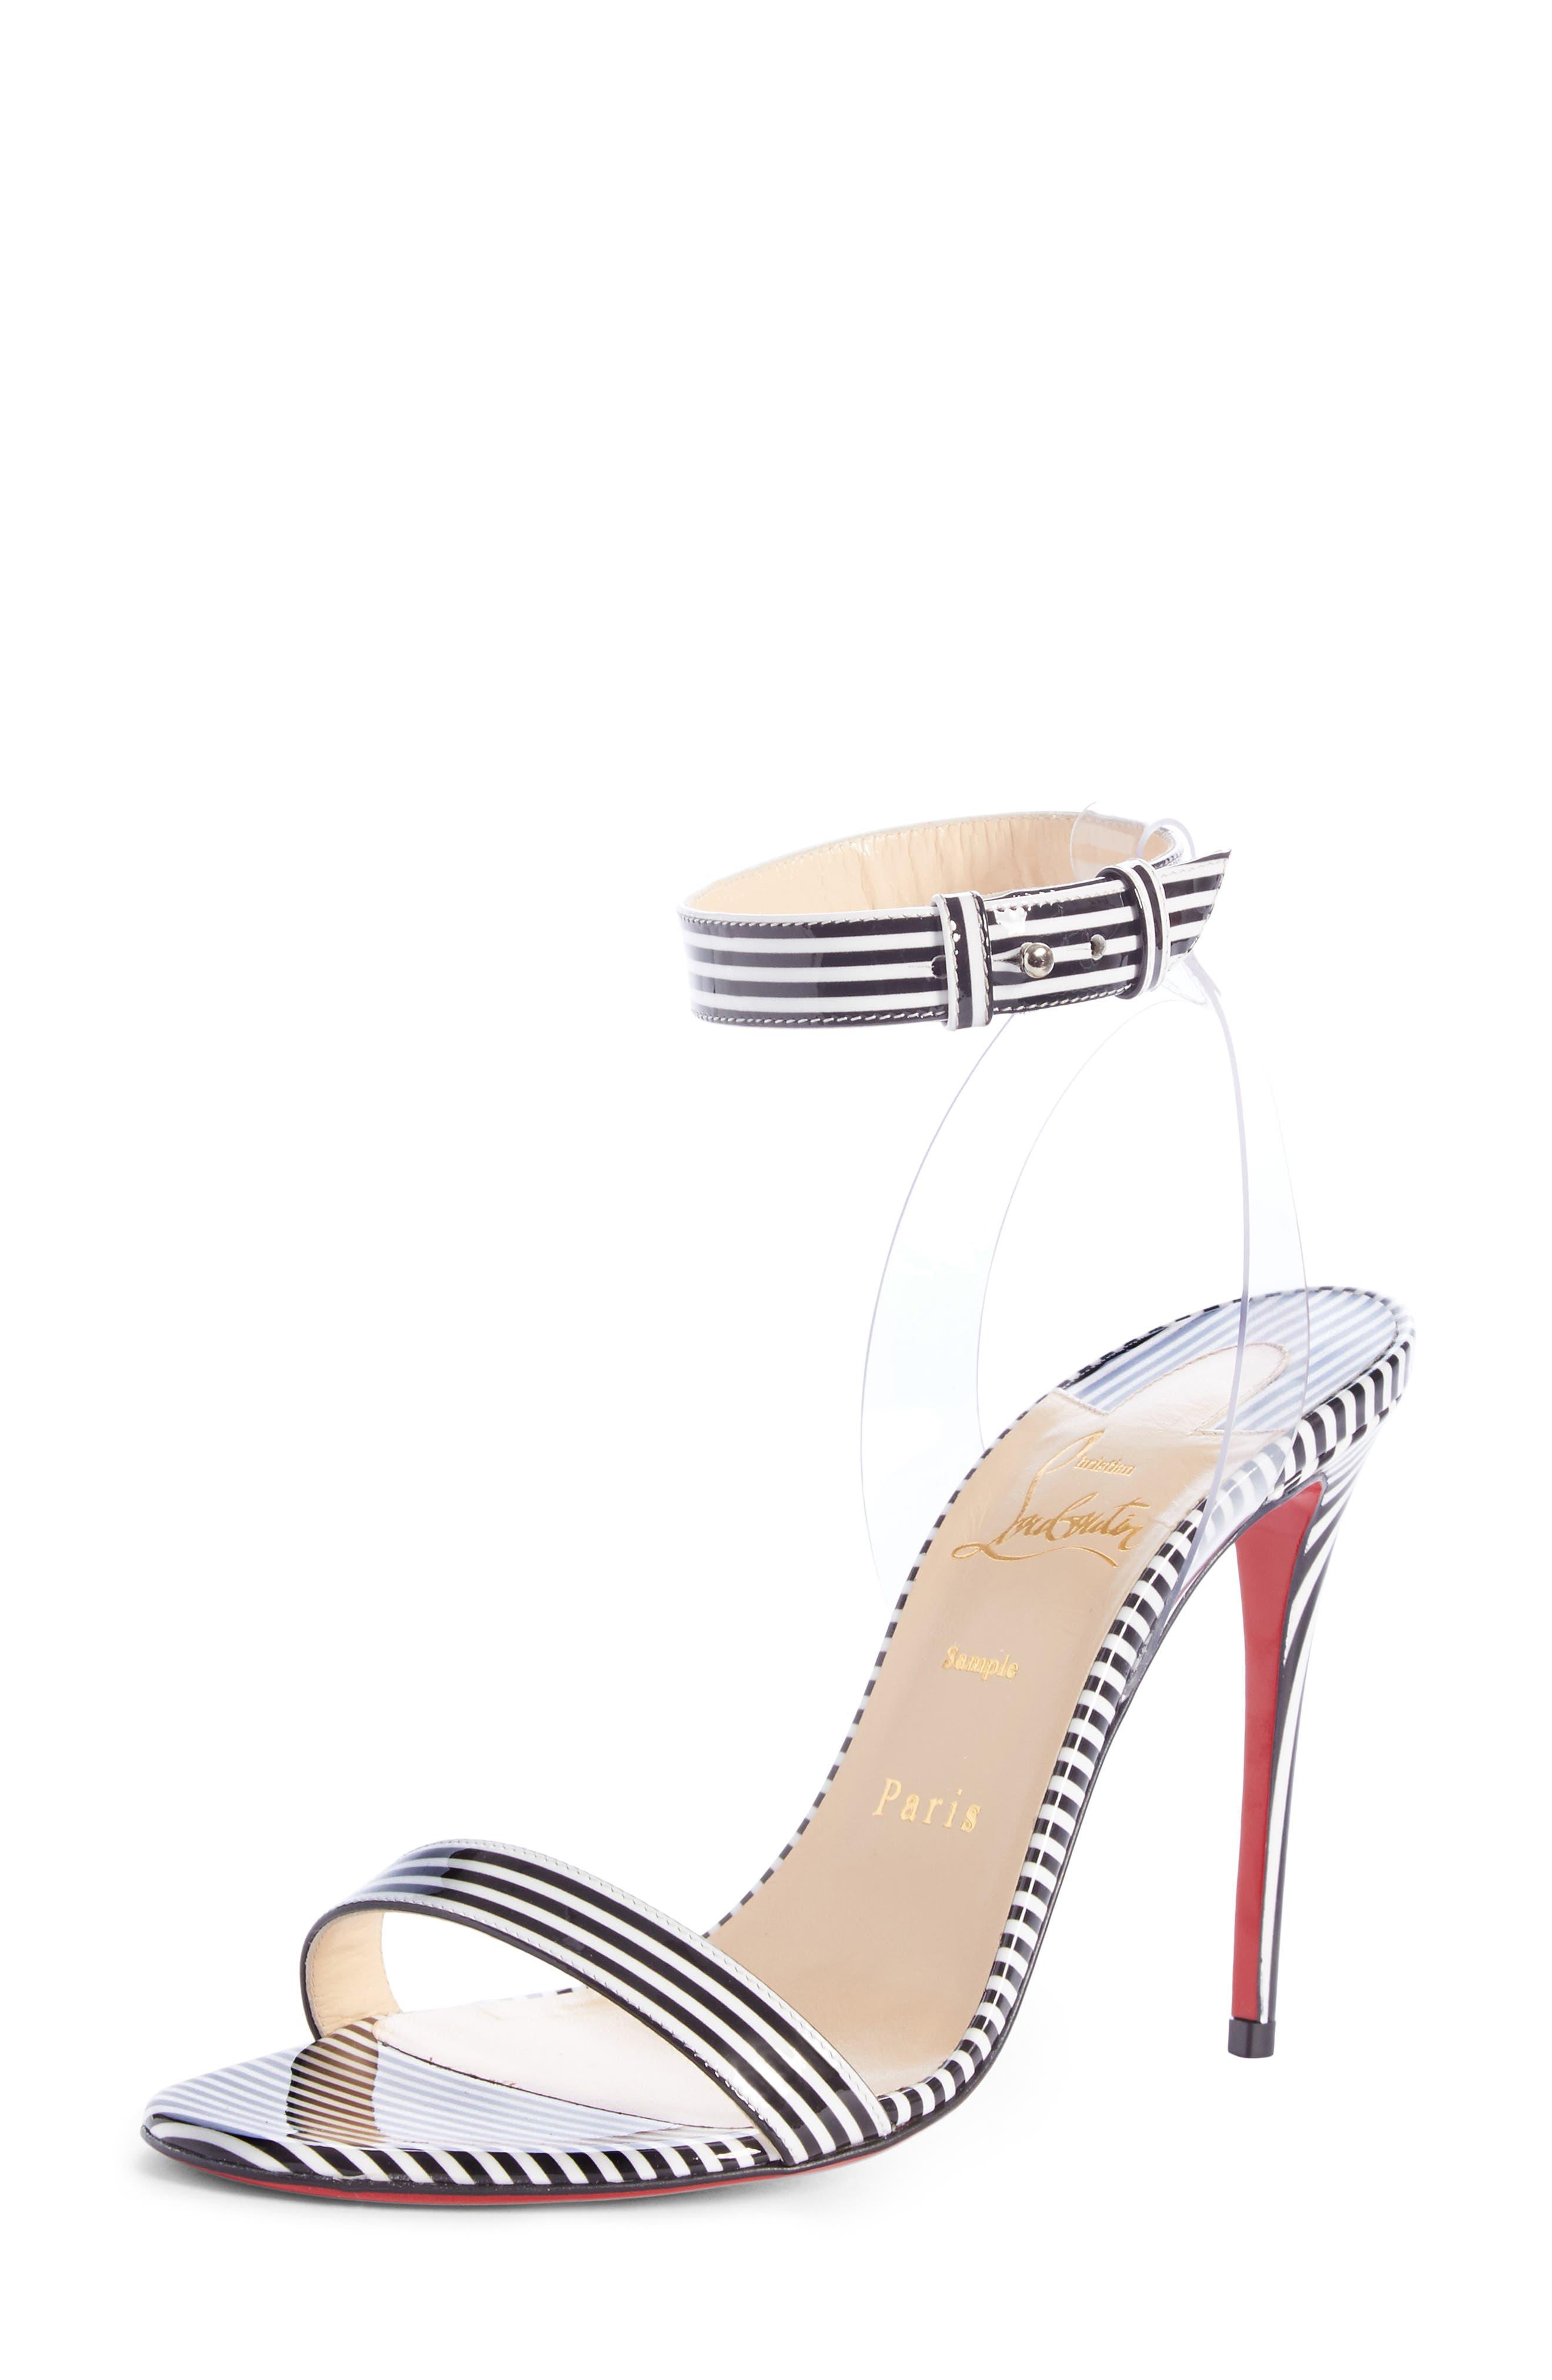 ef071c81533 Christian Louboutin Jonatina 100 Pvc-Trimmed Striped Patent-Leather Sandals  In Black Stripe